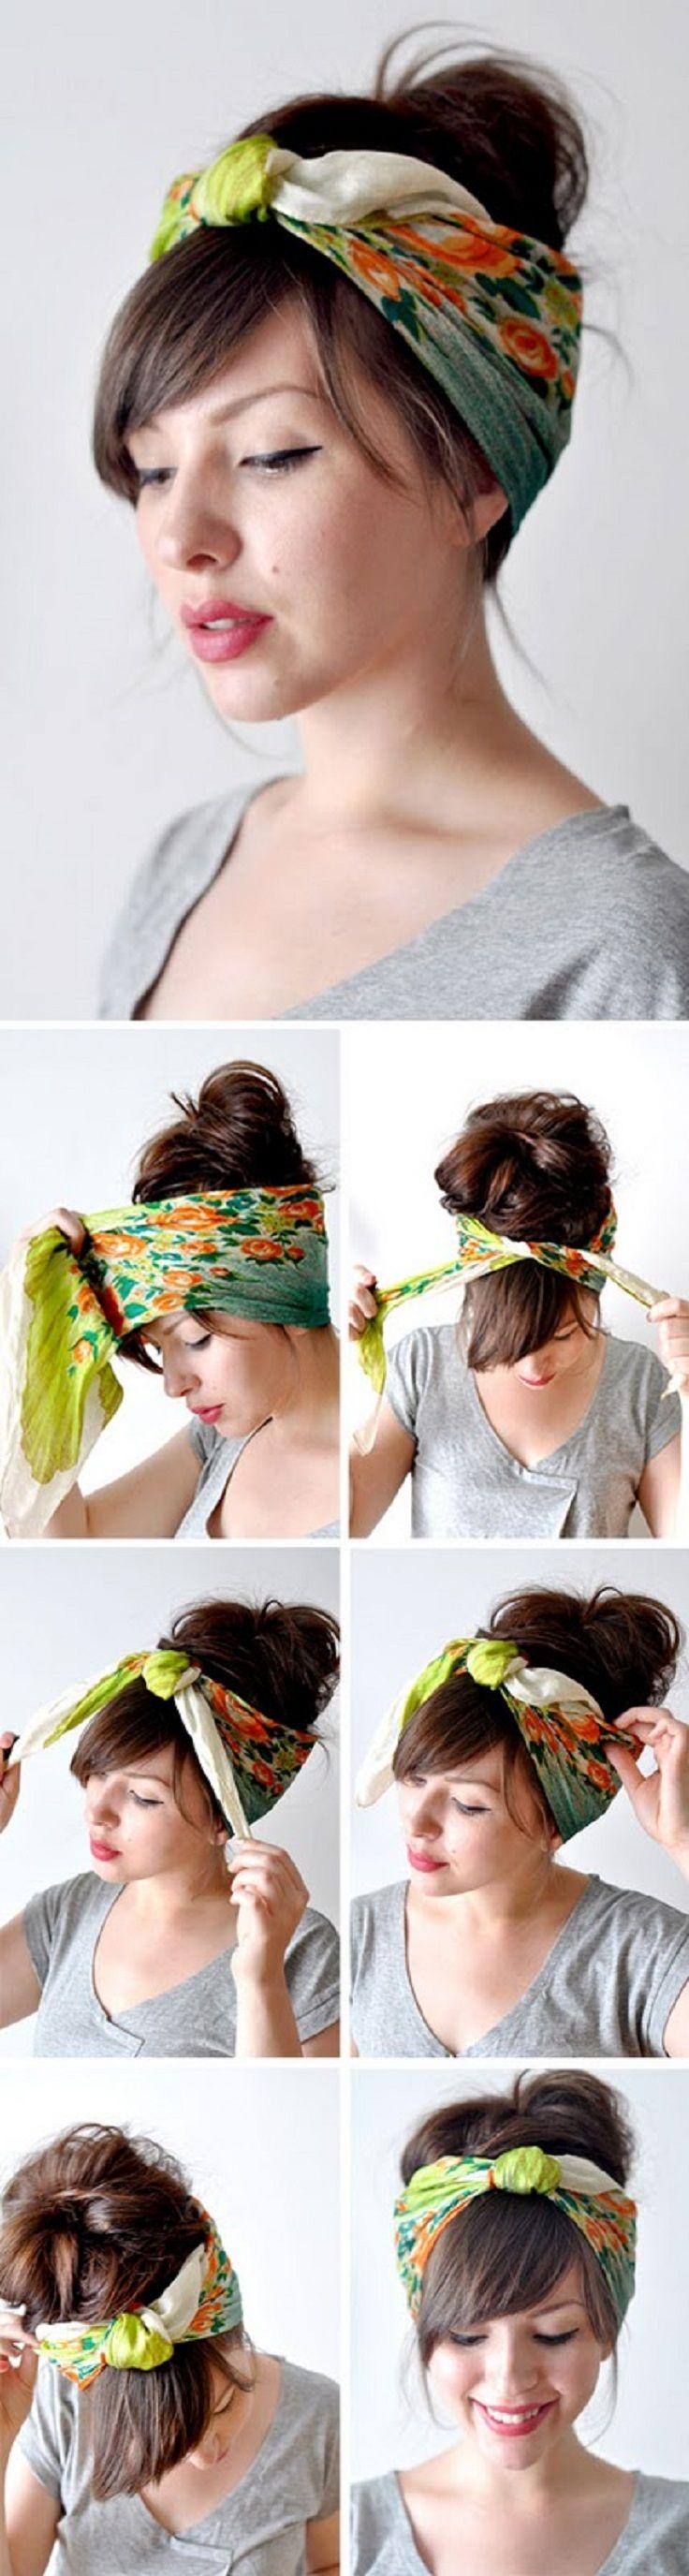 Top 10 Ways To Use Up Ripe Bananas Head Scarf Tutorial Scarf Hairstyles Bandana Hairstyles